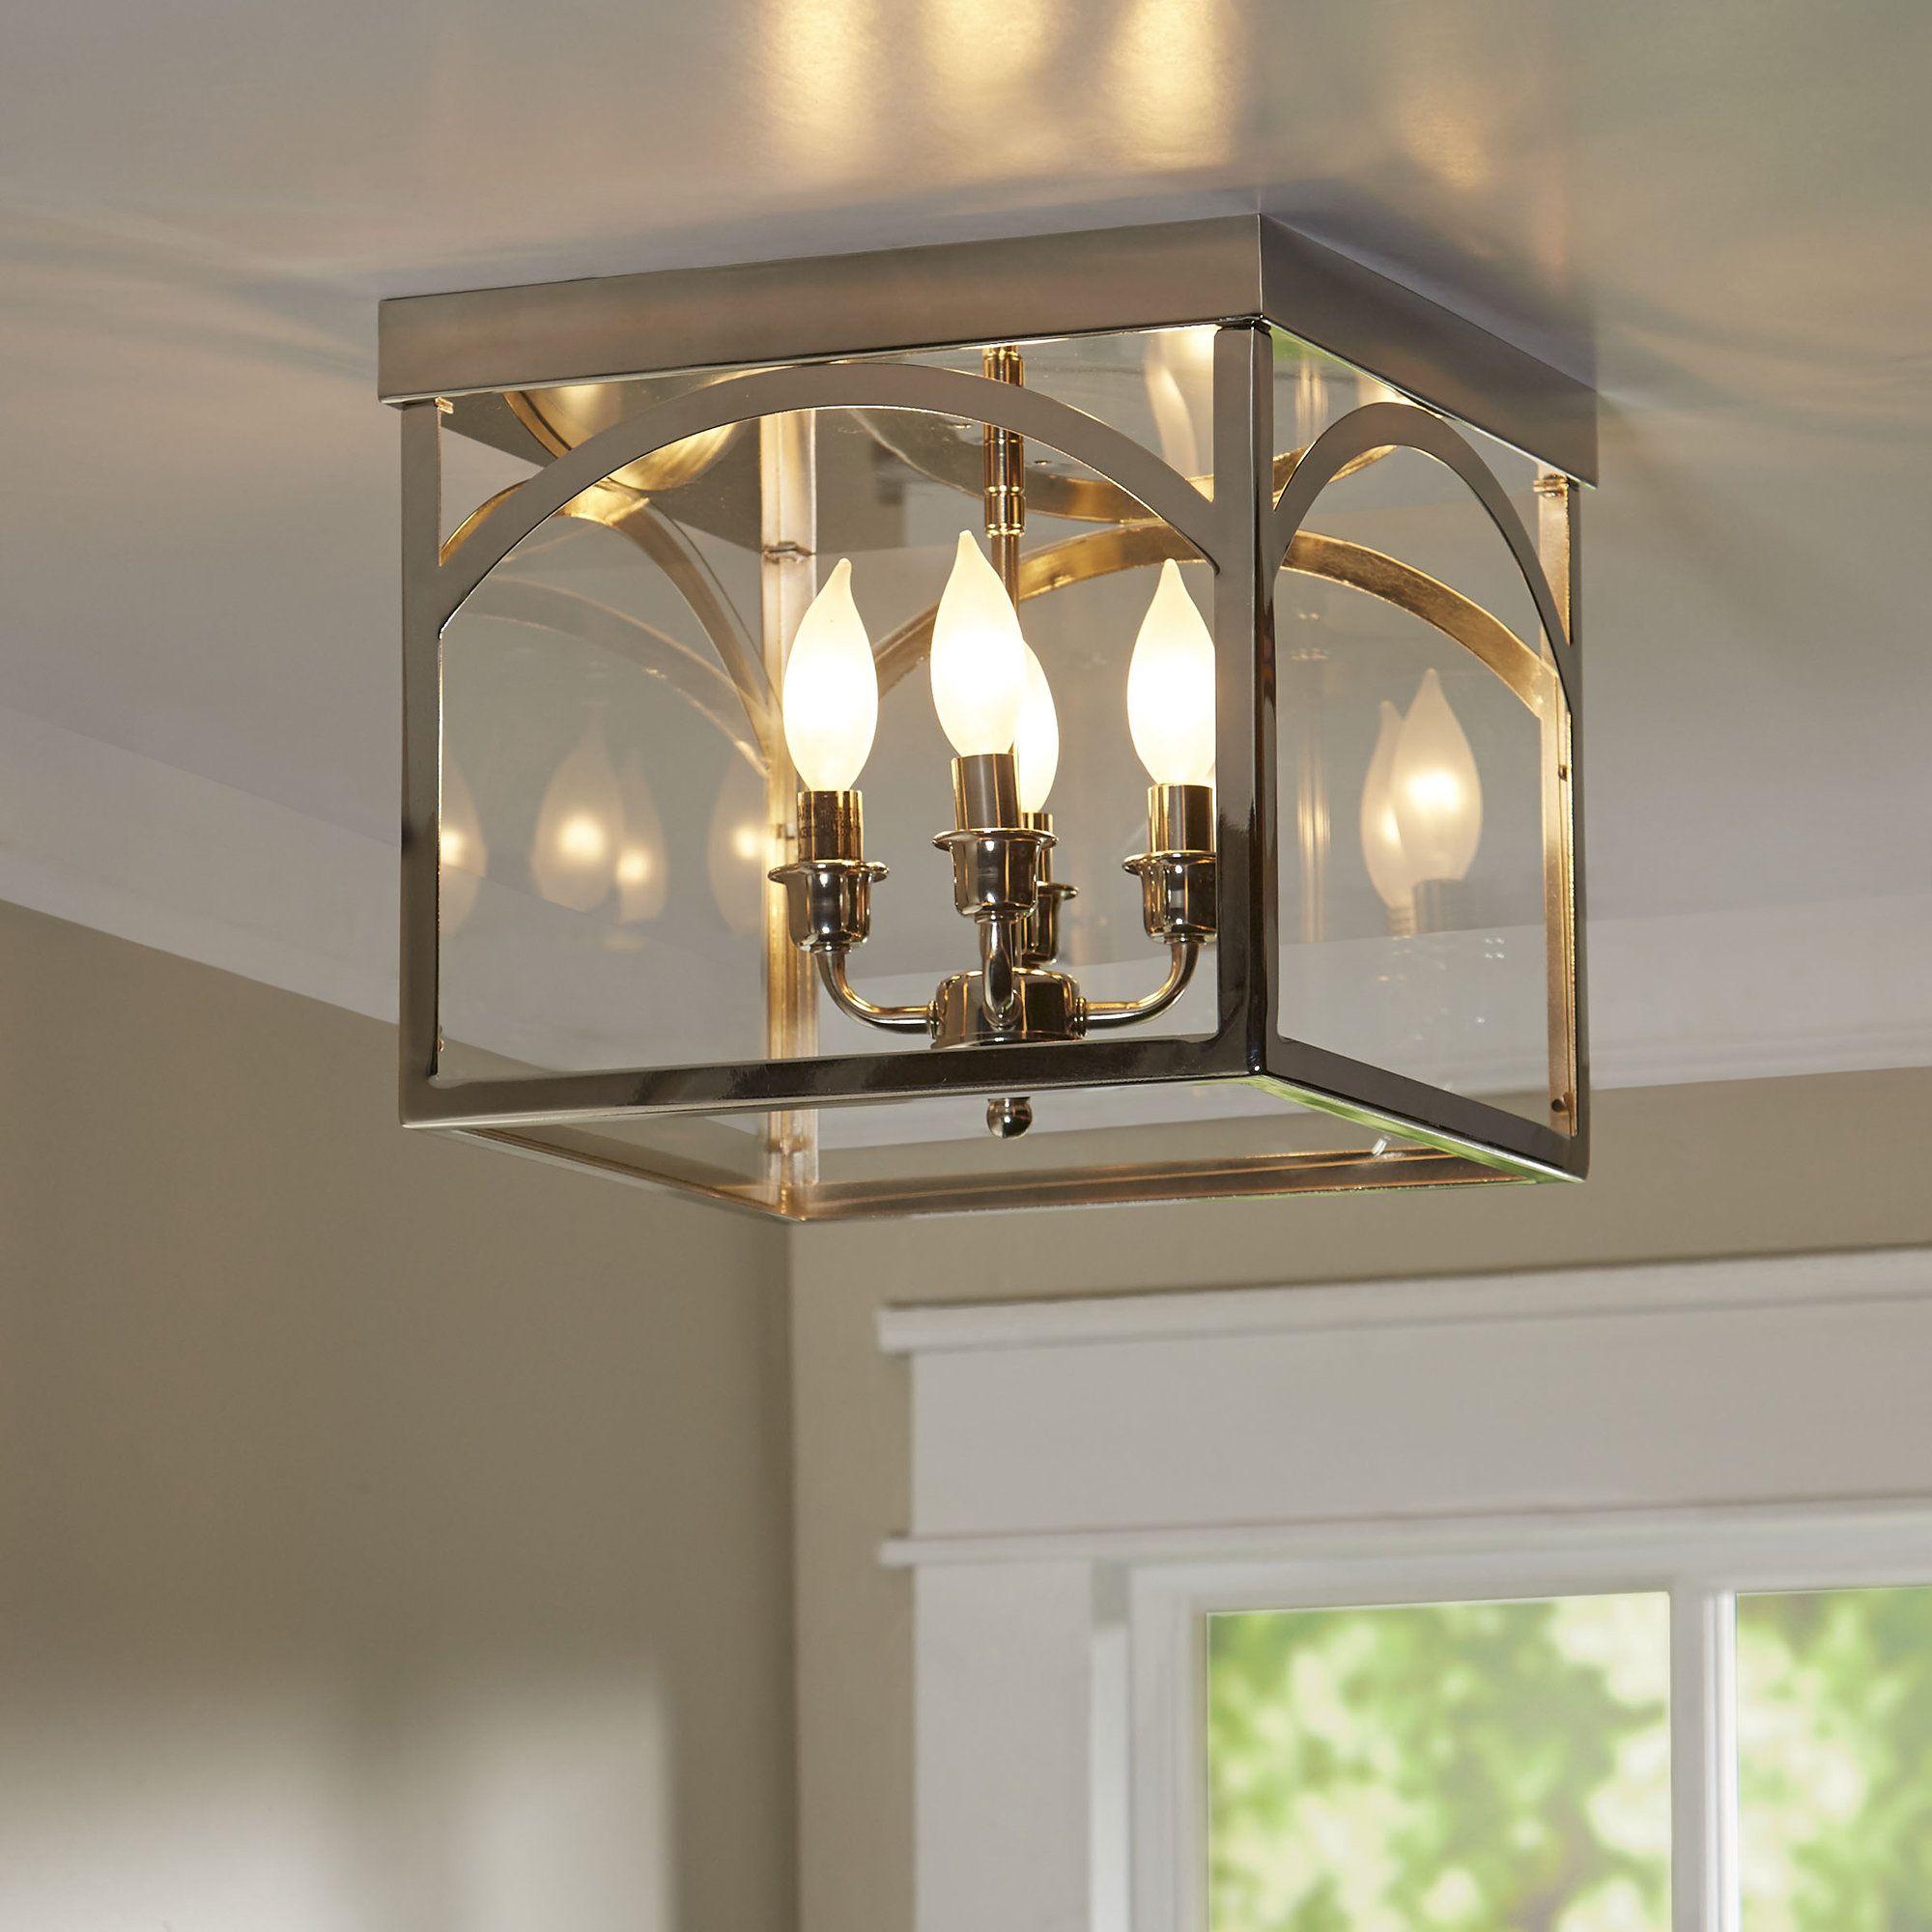 Covell 4 light 1238 lantern square flush mount